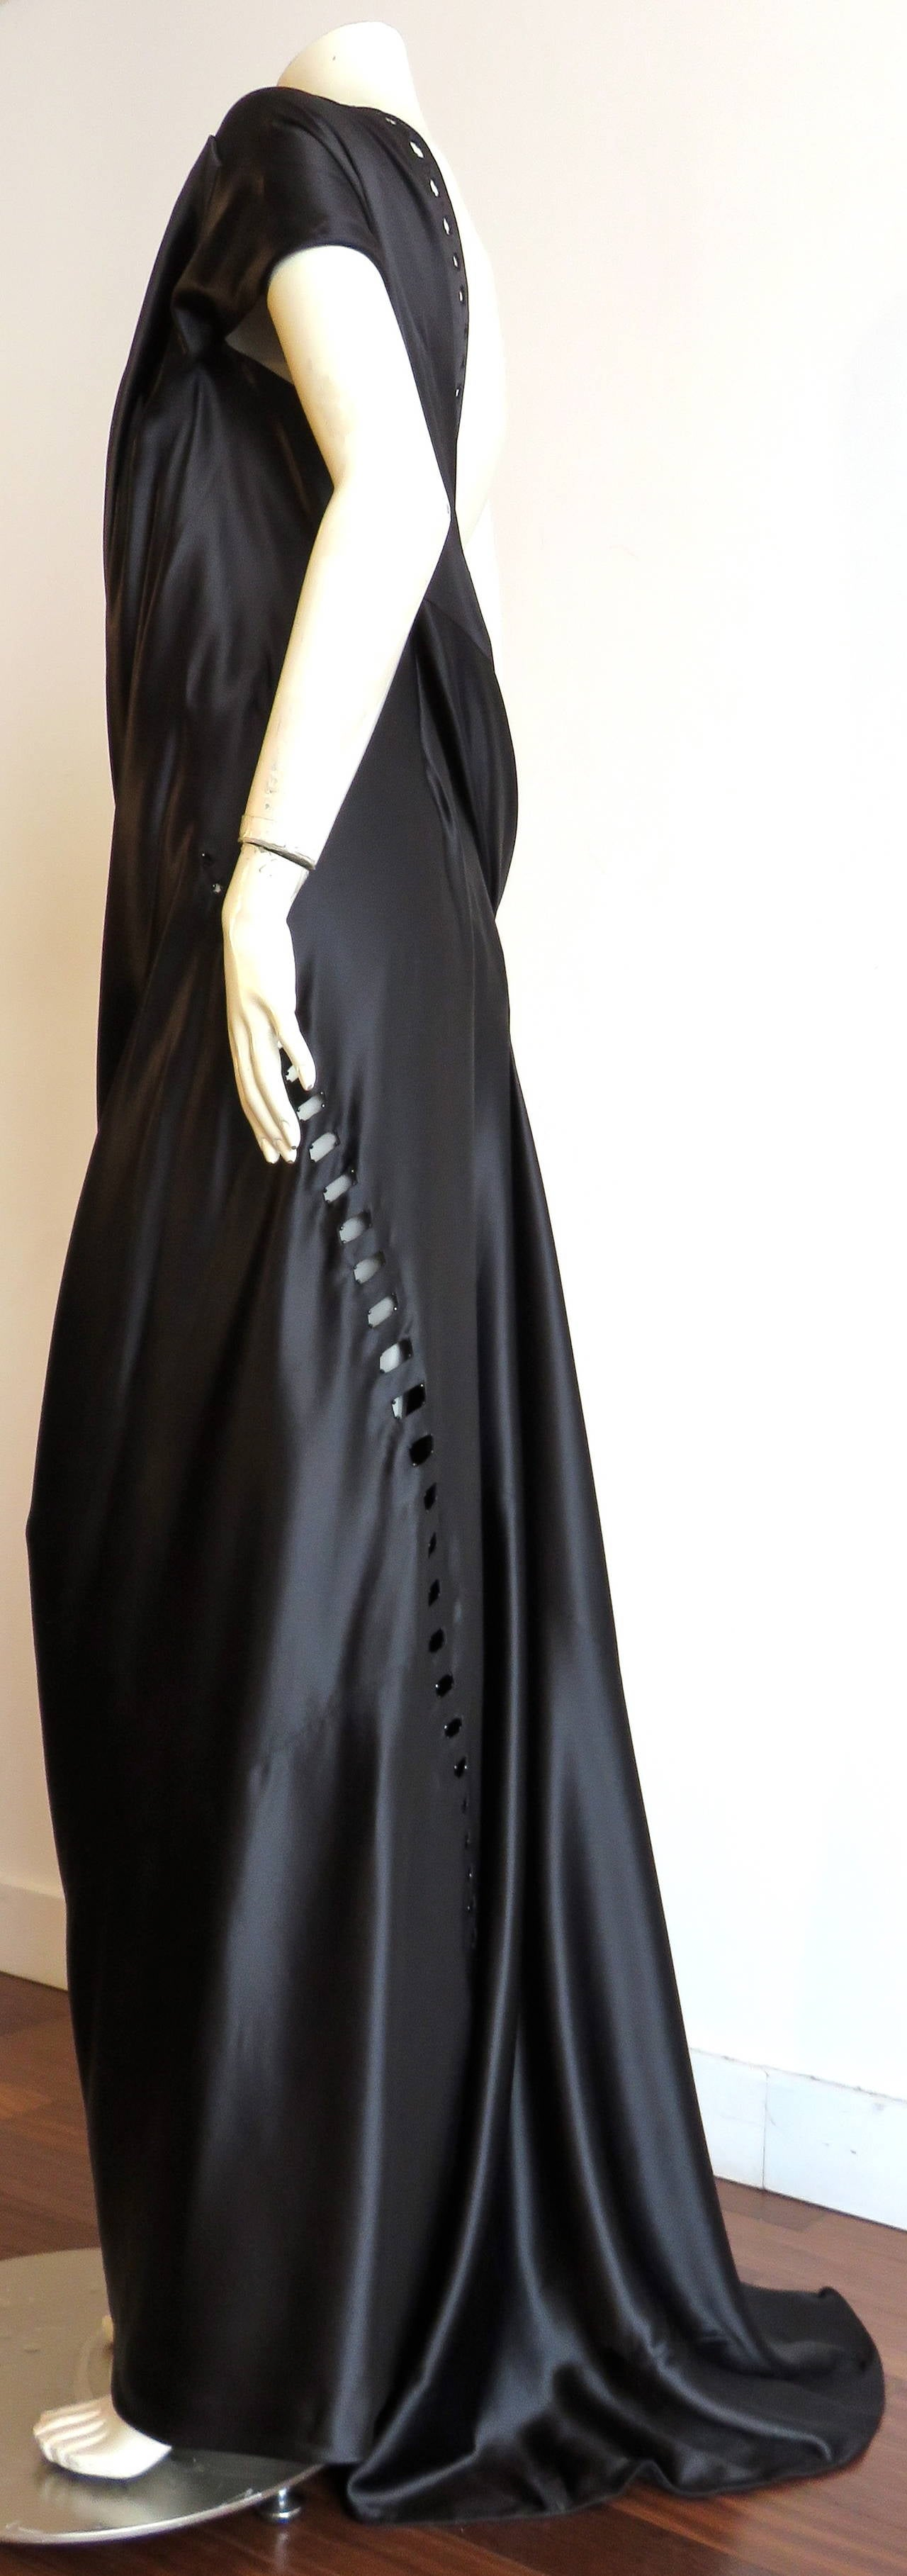 Marc Jacobs Evening Dresses 7